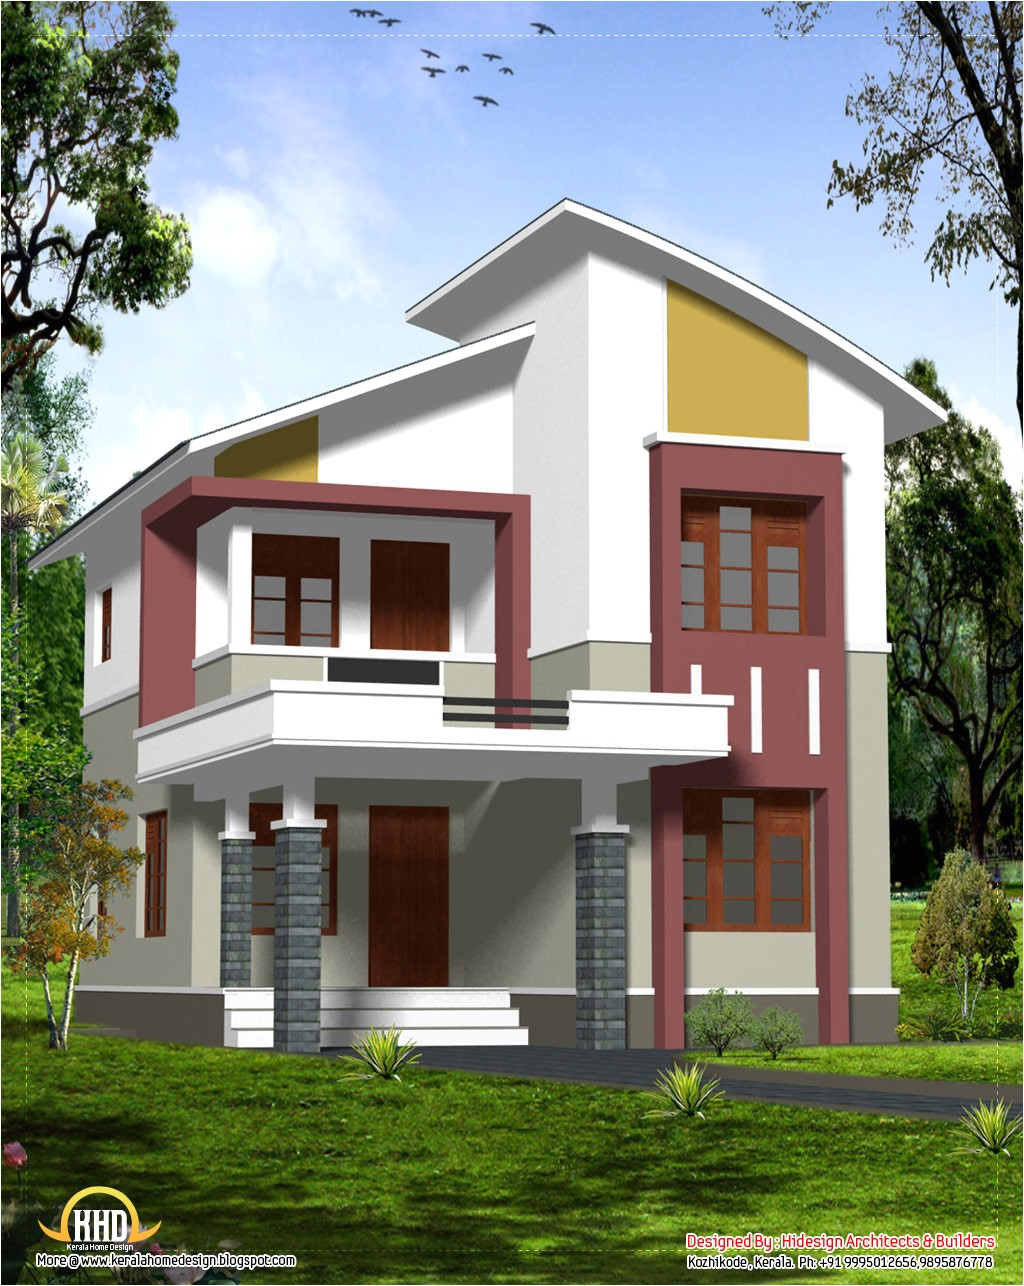 budget home design 2140 sq ft more